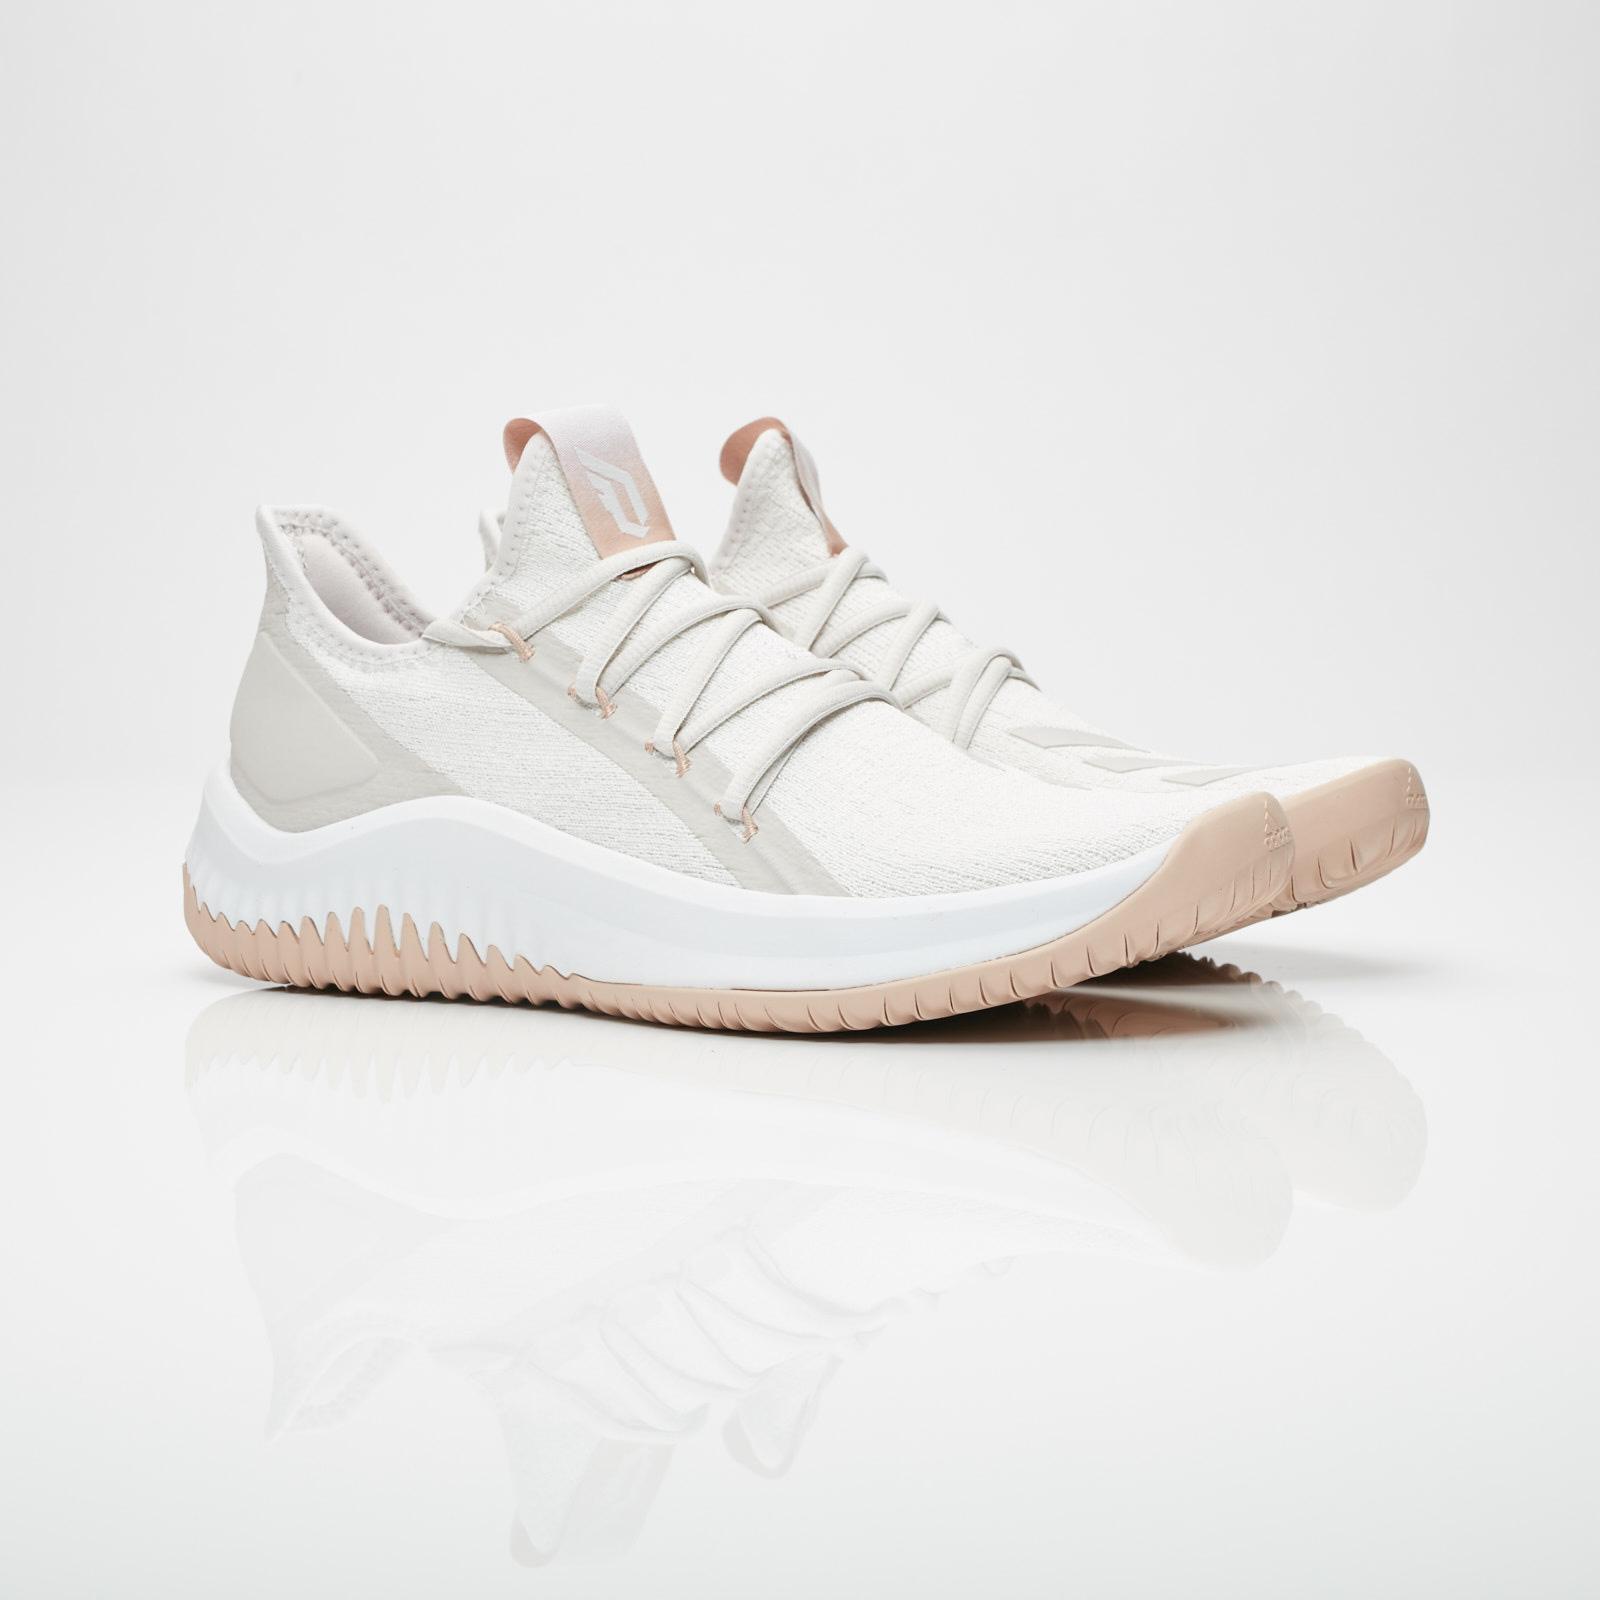 separation shoes 23e4b 65776 ... get adidas performance dame d.o.l.l.a. ca9e6 c4902